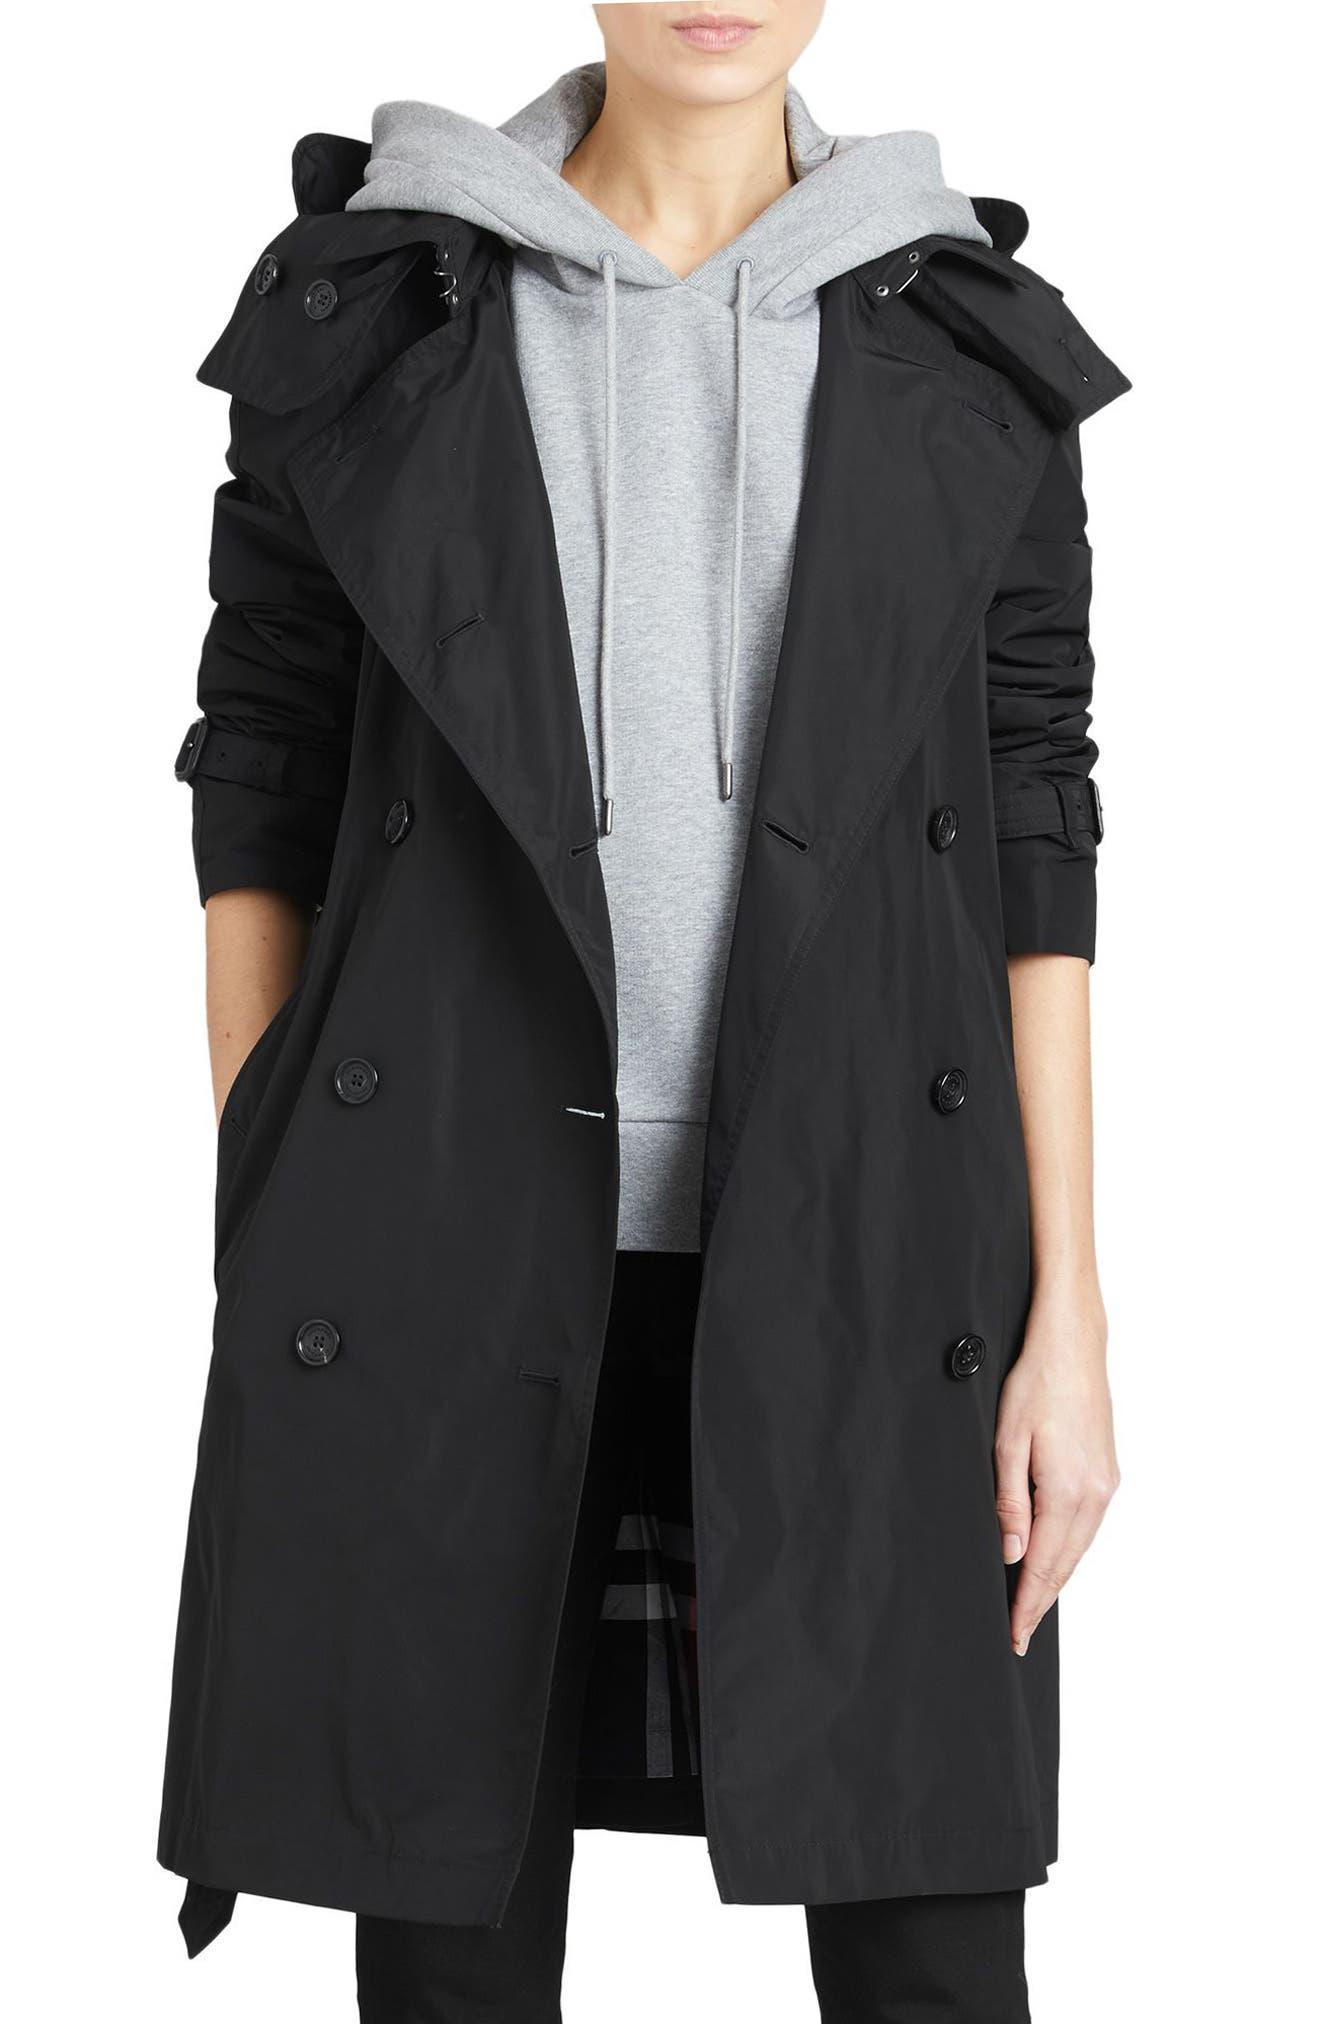 Amberford Taffeta Trench Coat with Detachable Hood, Main, color, BLACK